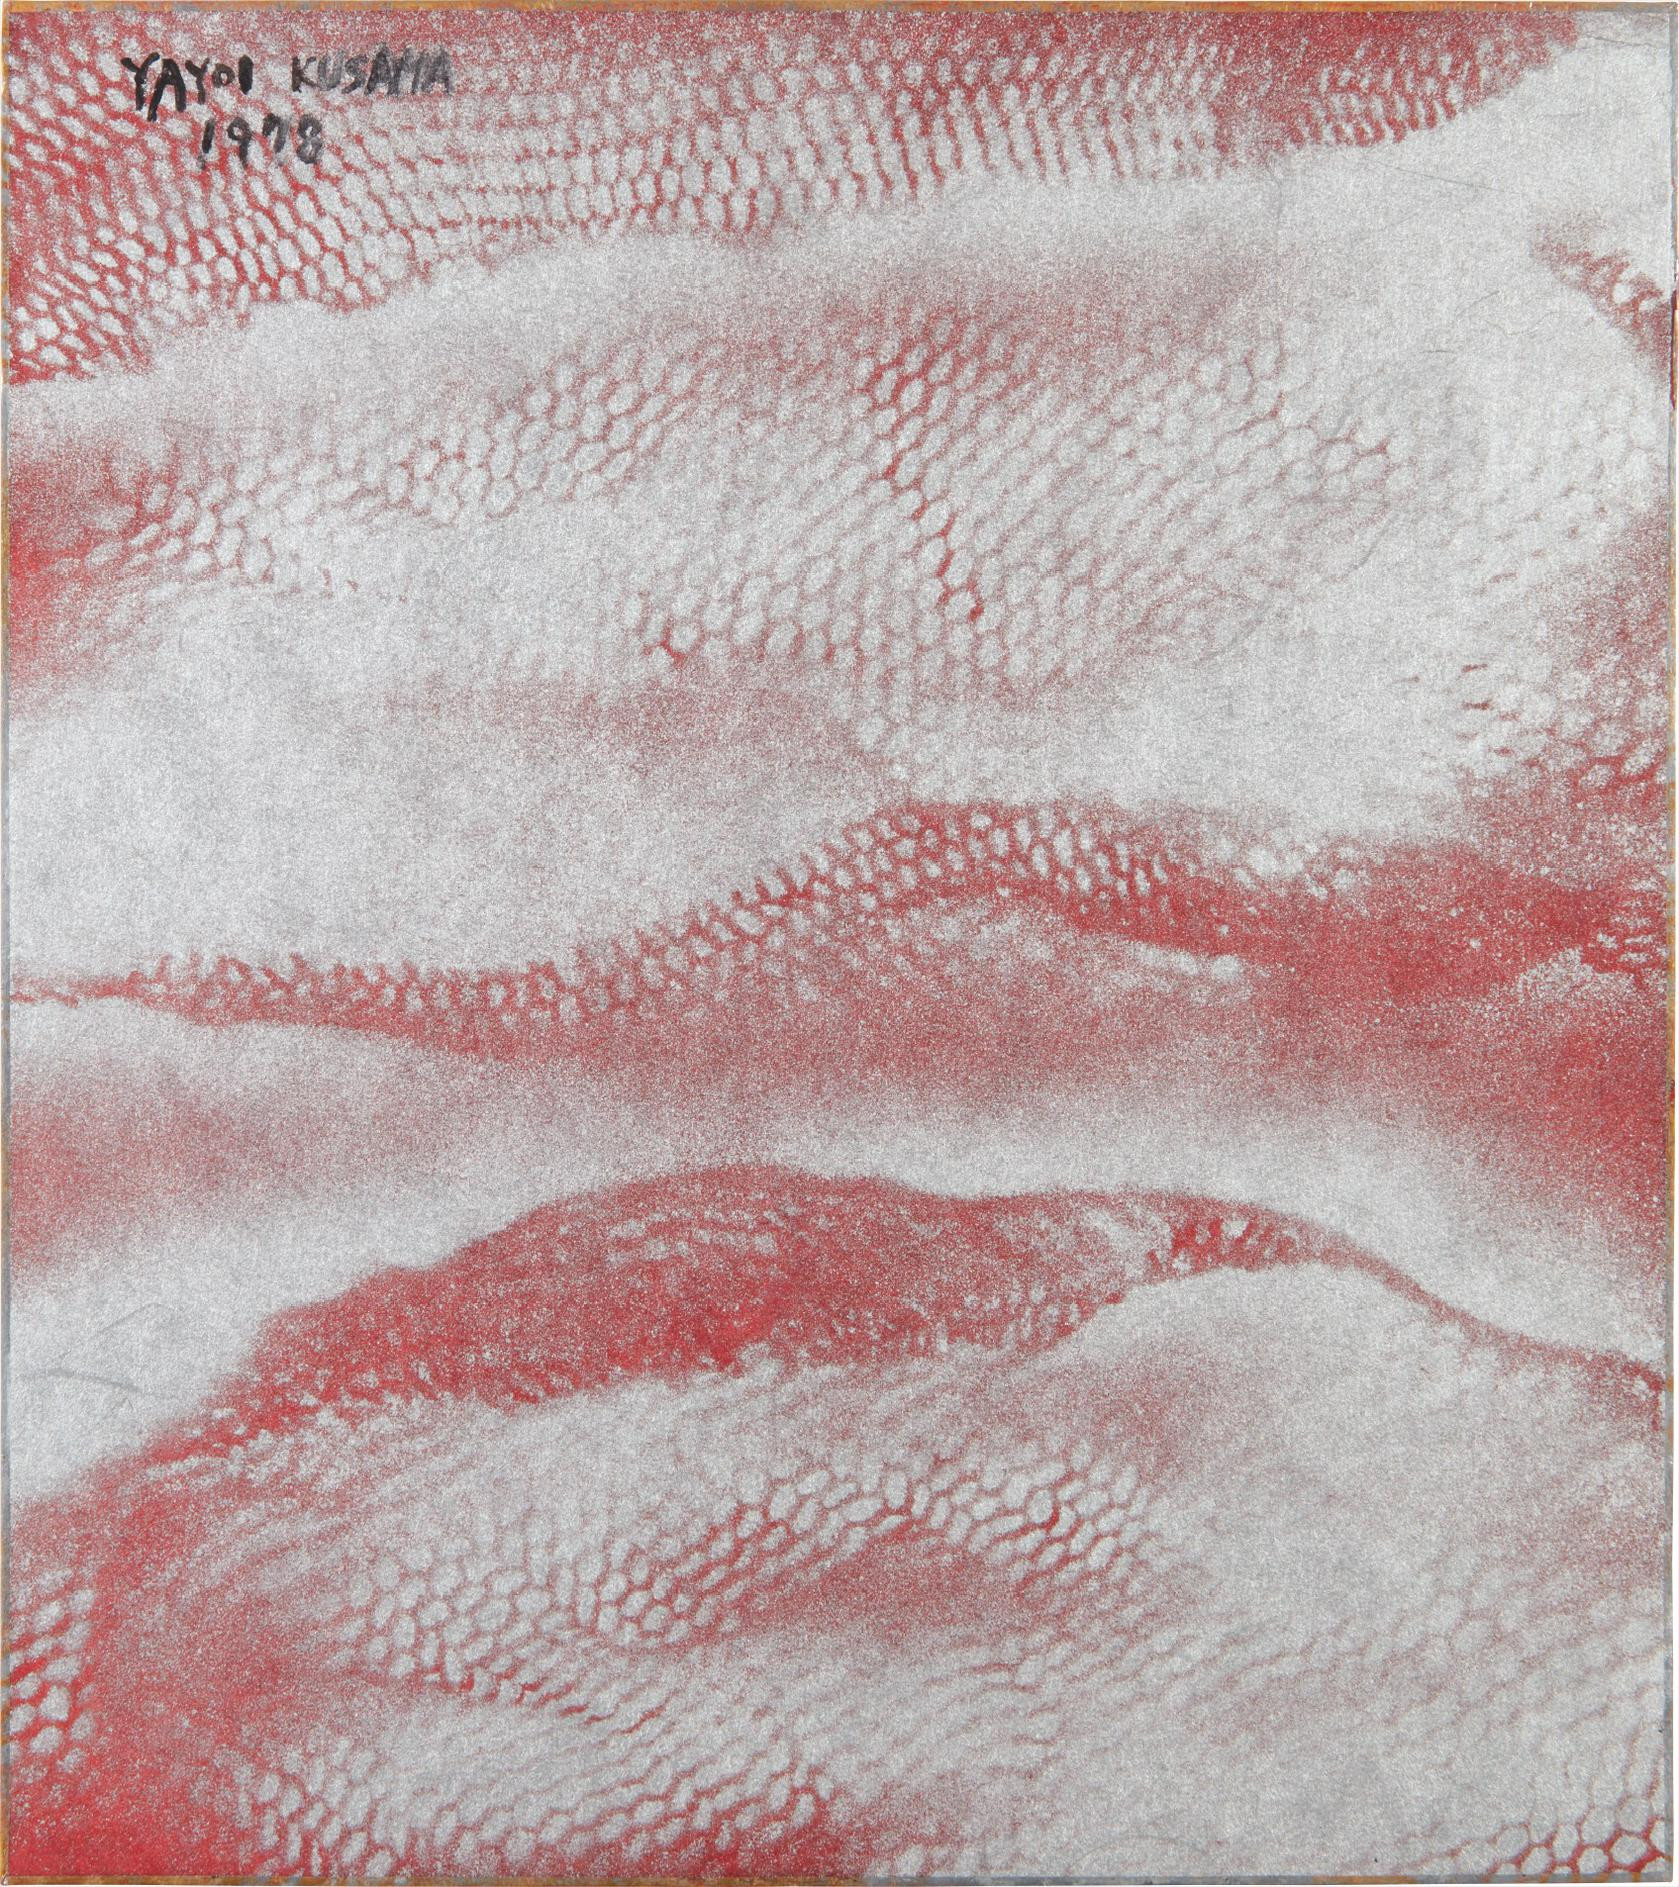 Yayoi Kusama-Looking At Silver Clouds-1978